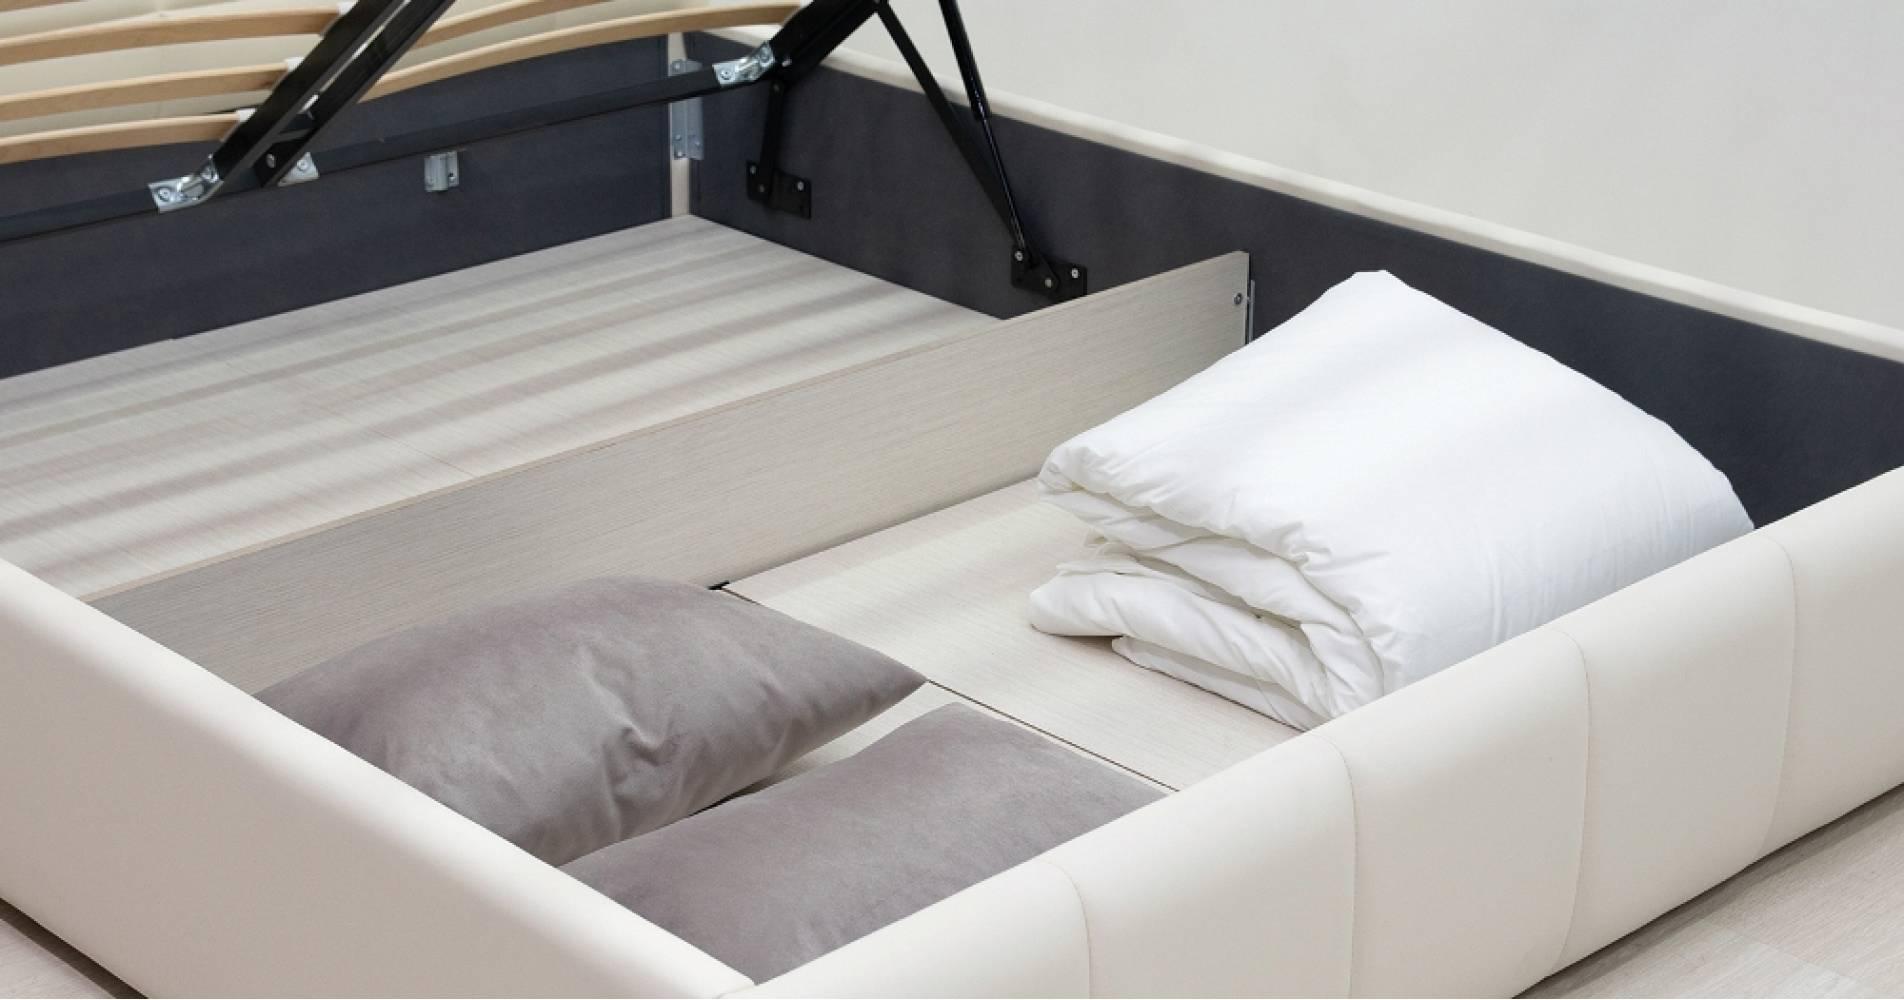 Дно кроватное 1600 Стандарт ЛДСП для кровати ХЛОЯ (шоколад)